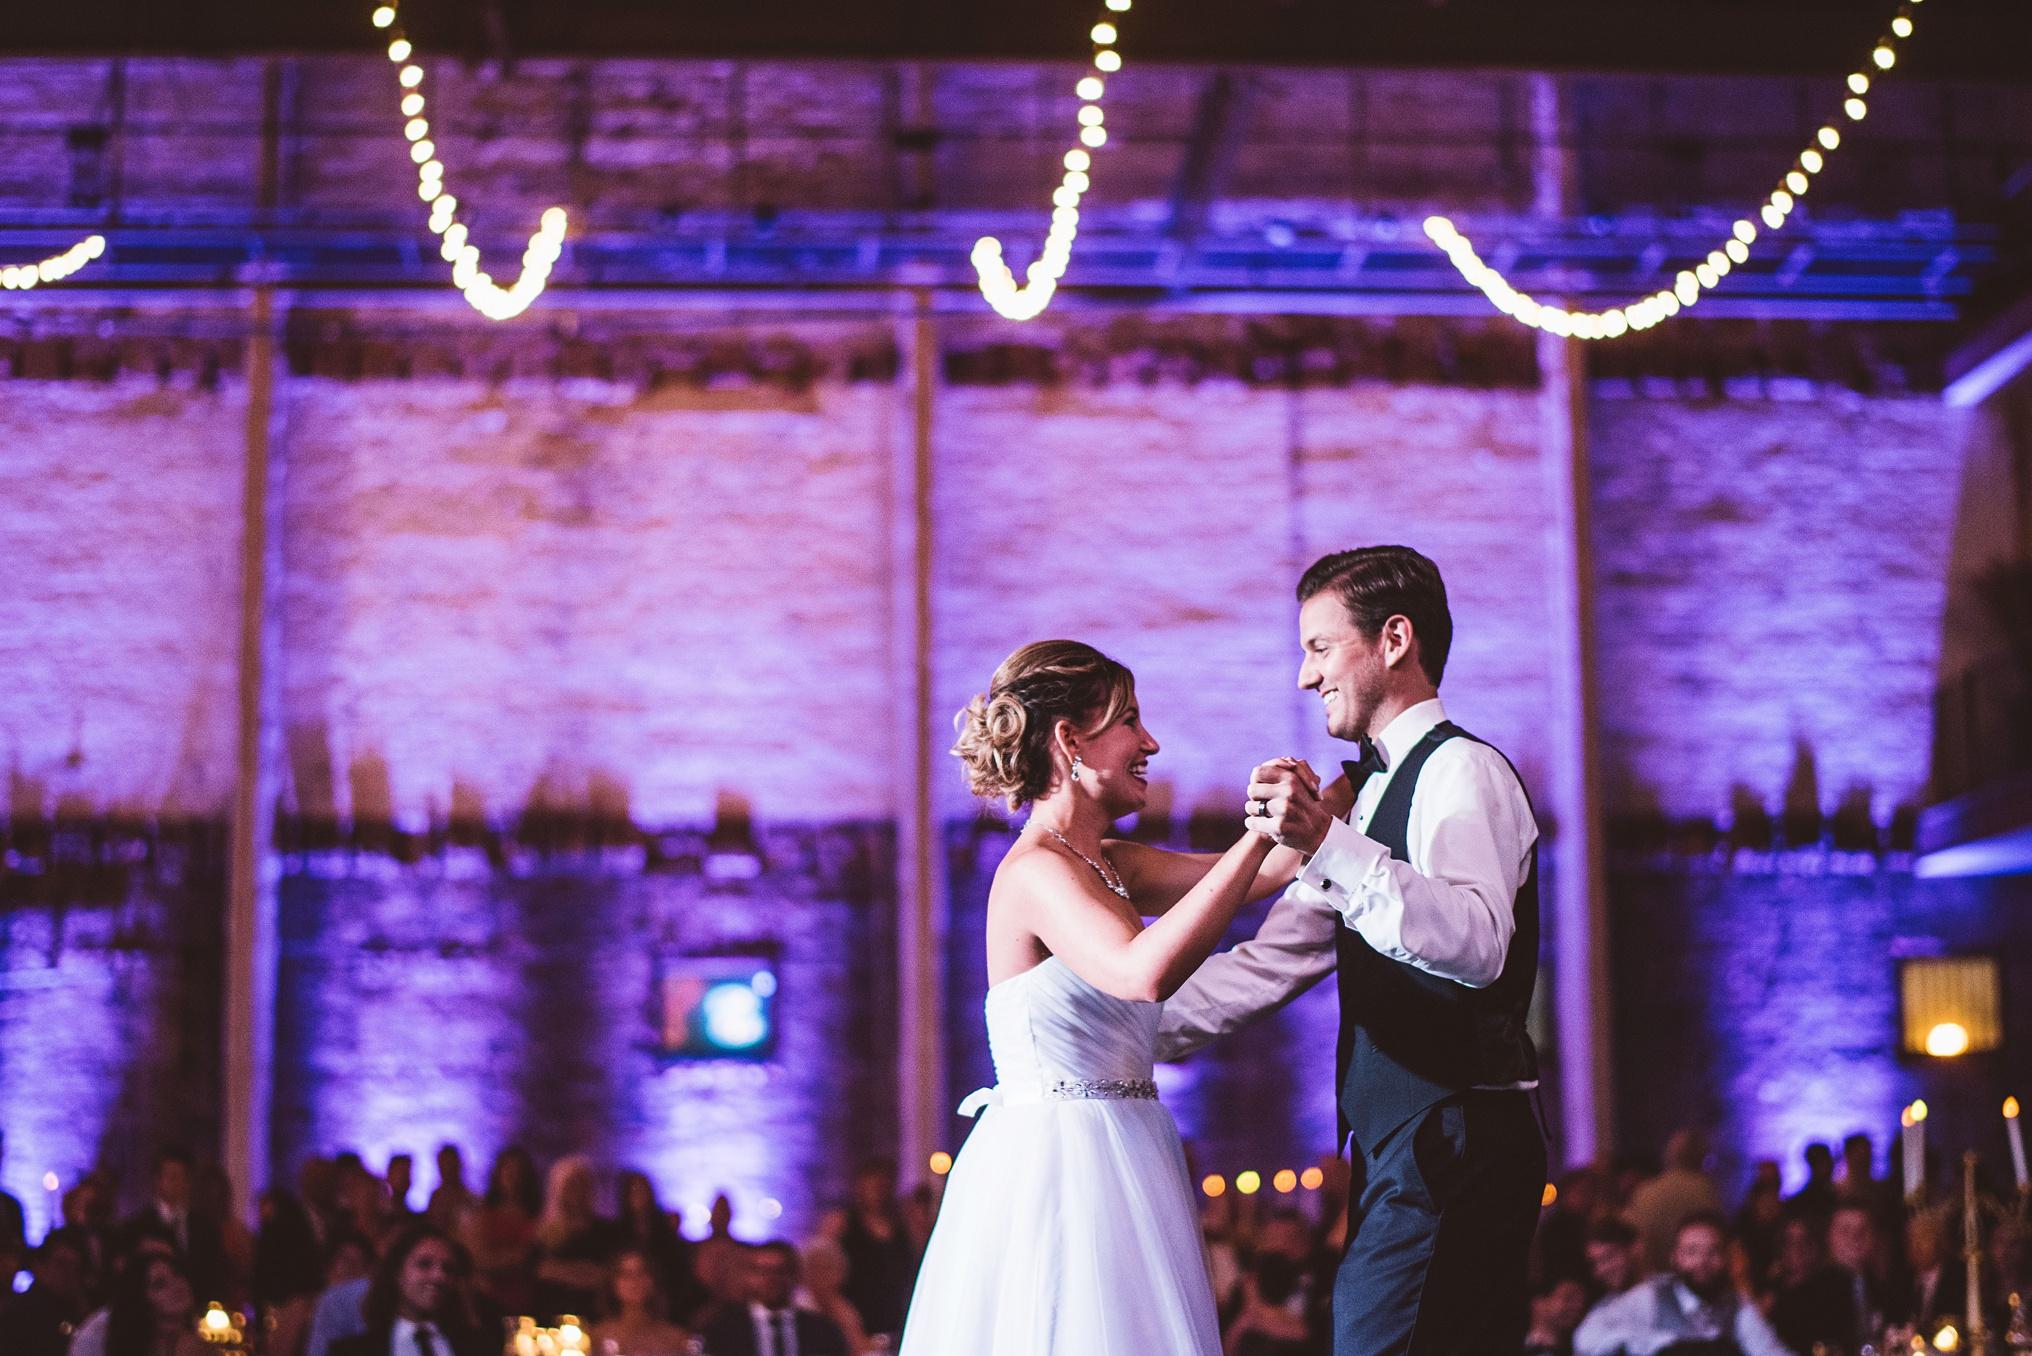 best_wedding_photography_2017_by_lucas_botz_photography_051.jpg